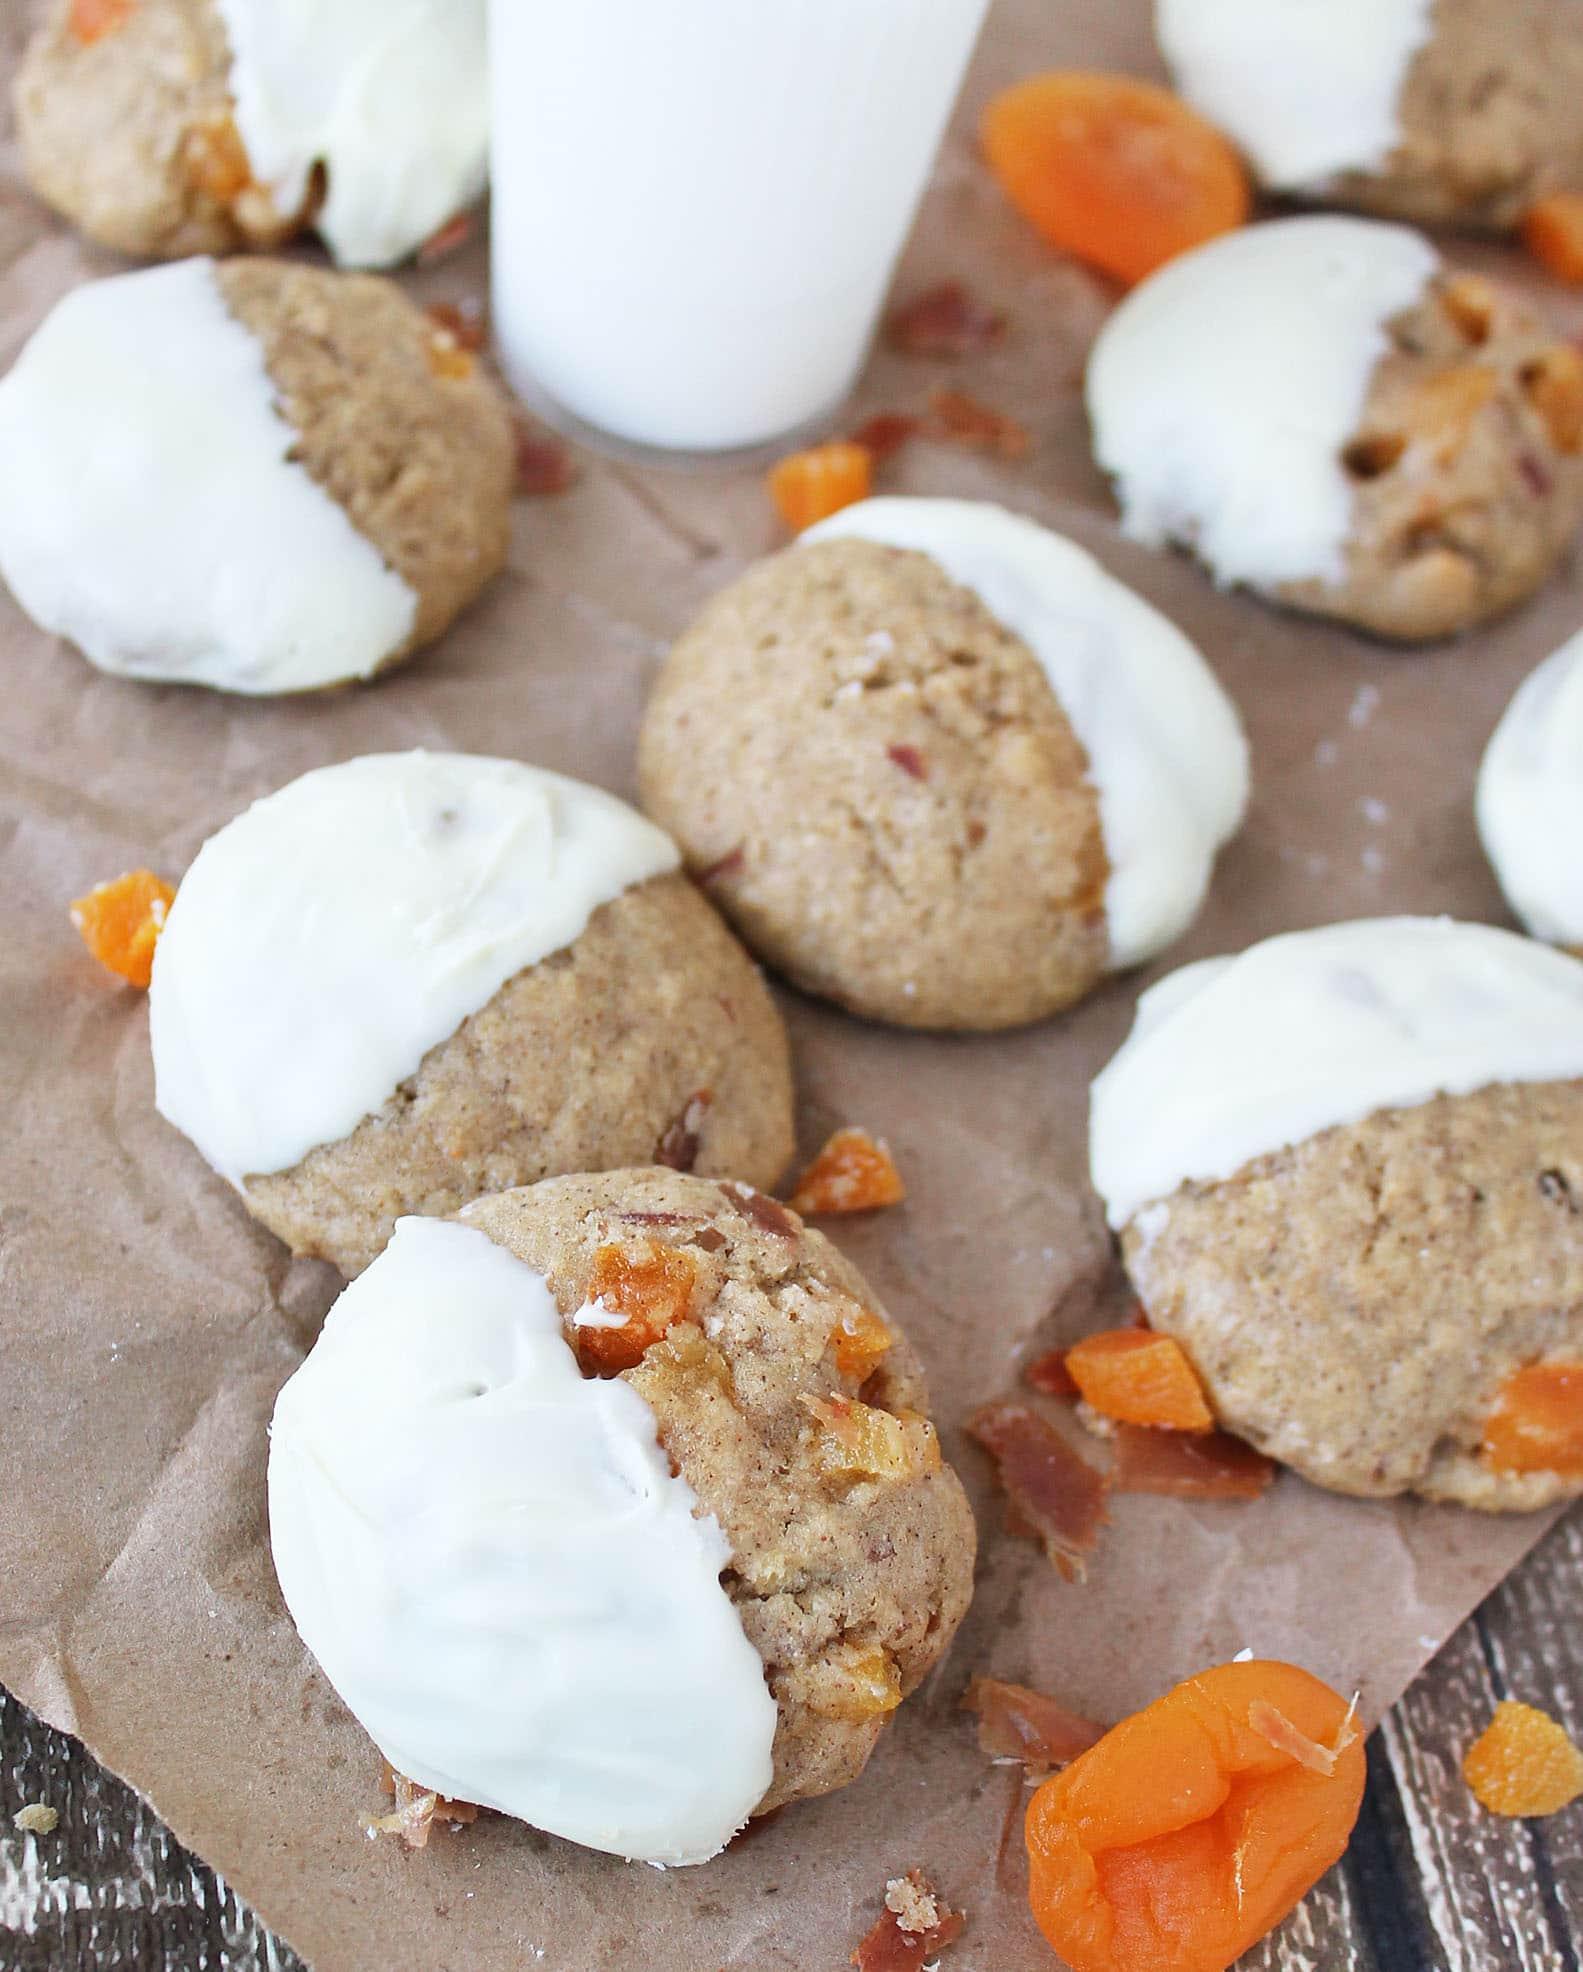 Gluten Free White Chocolate Glazed Prosciutto & Apricot Cookies